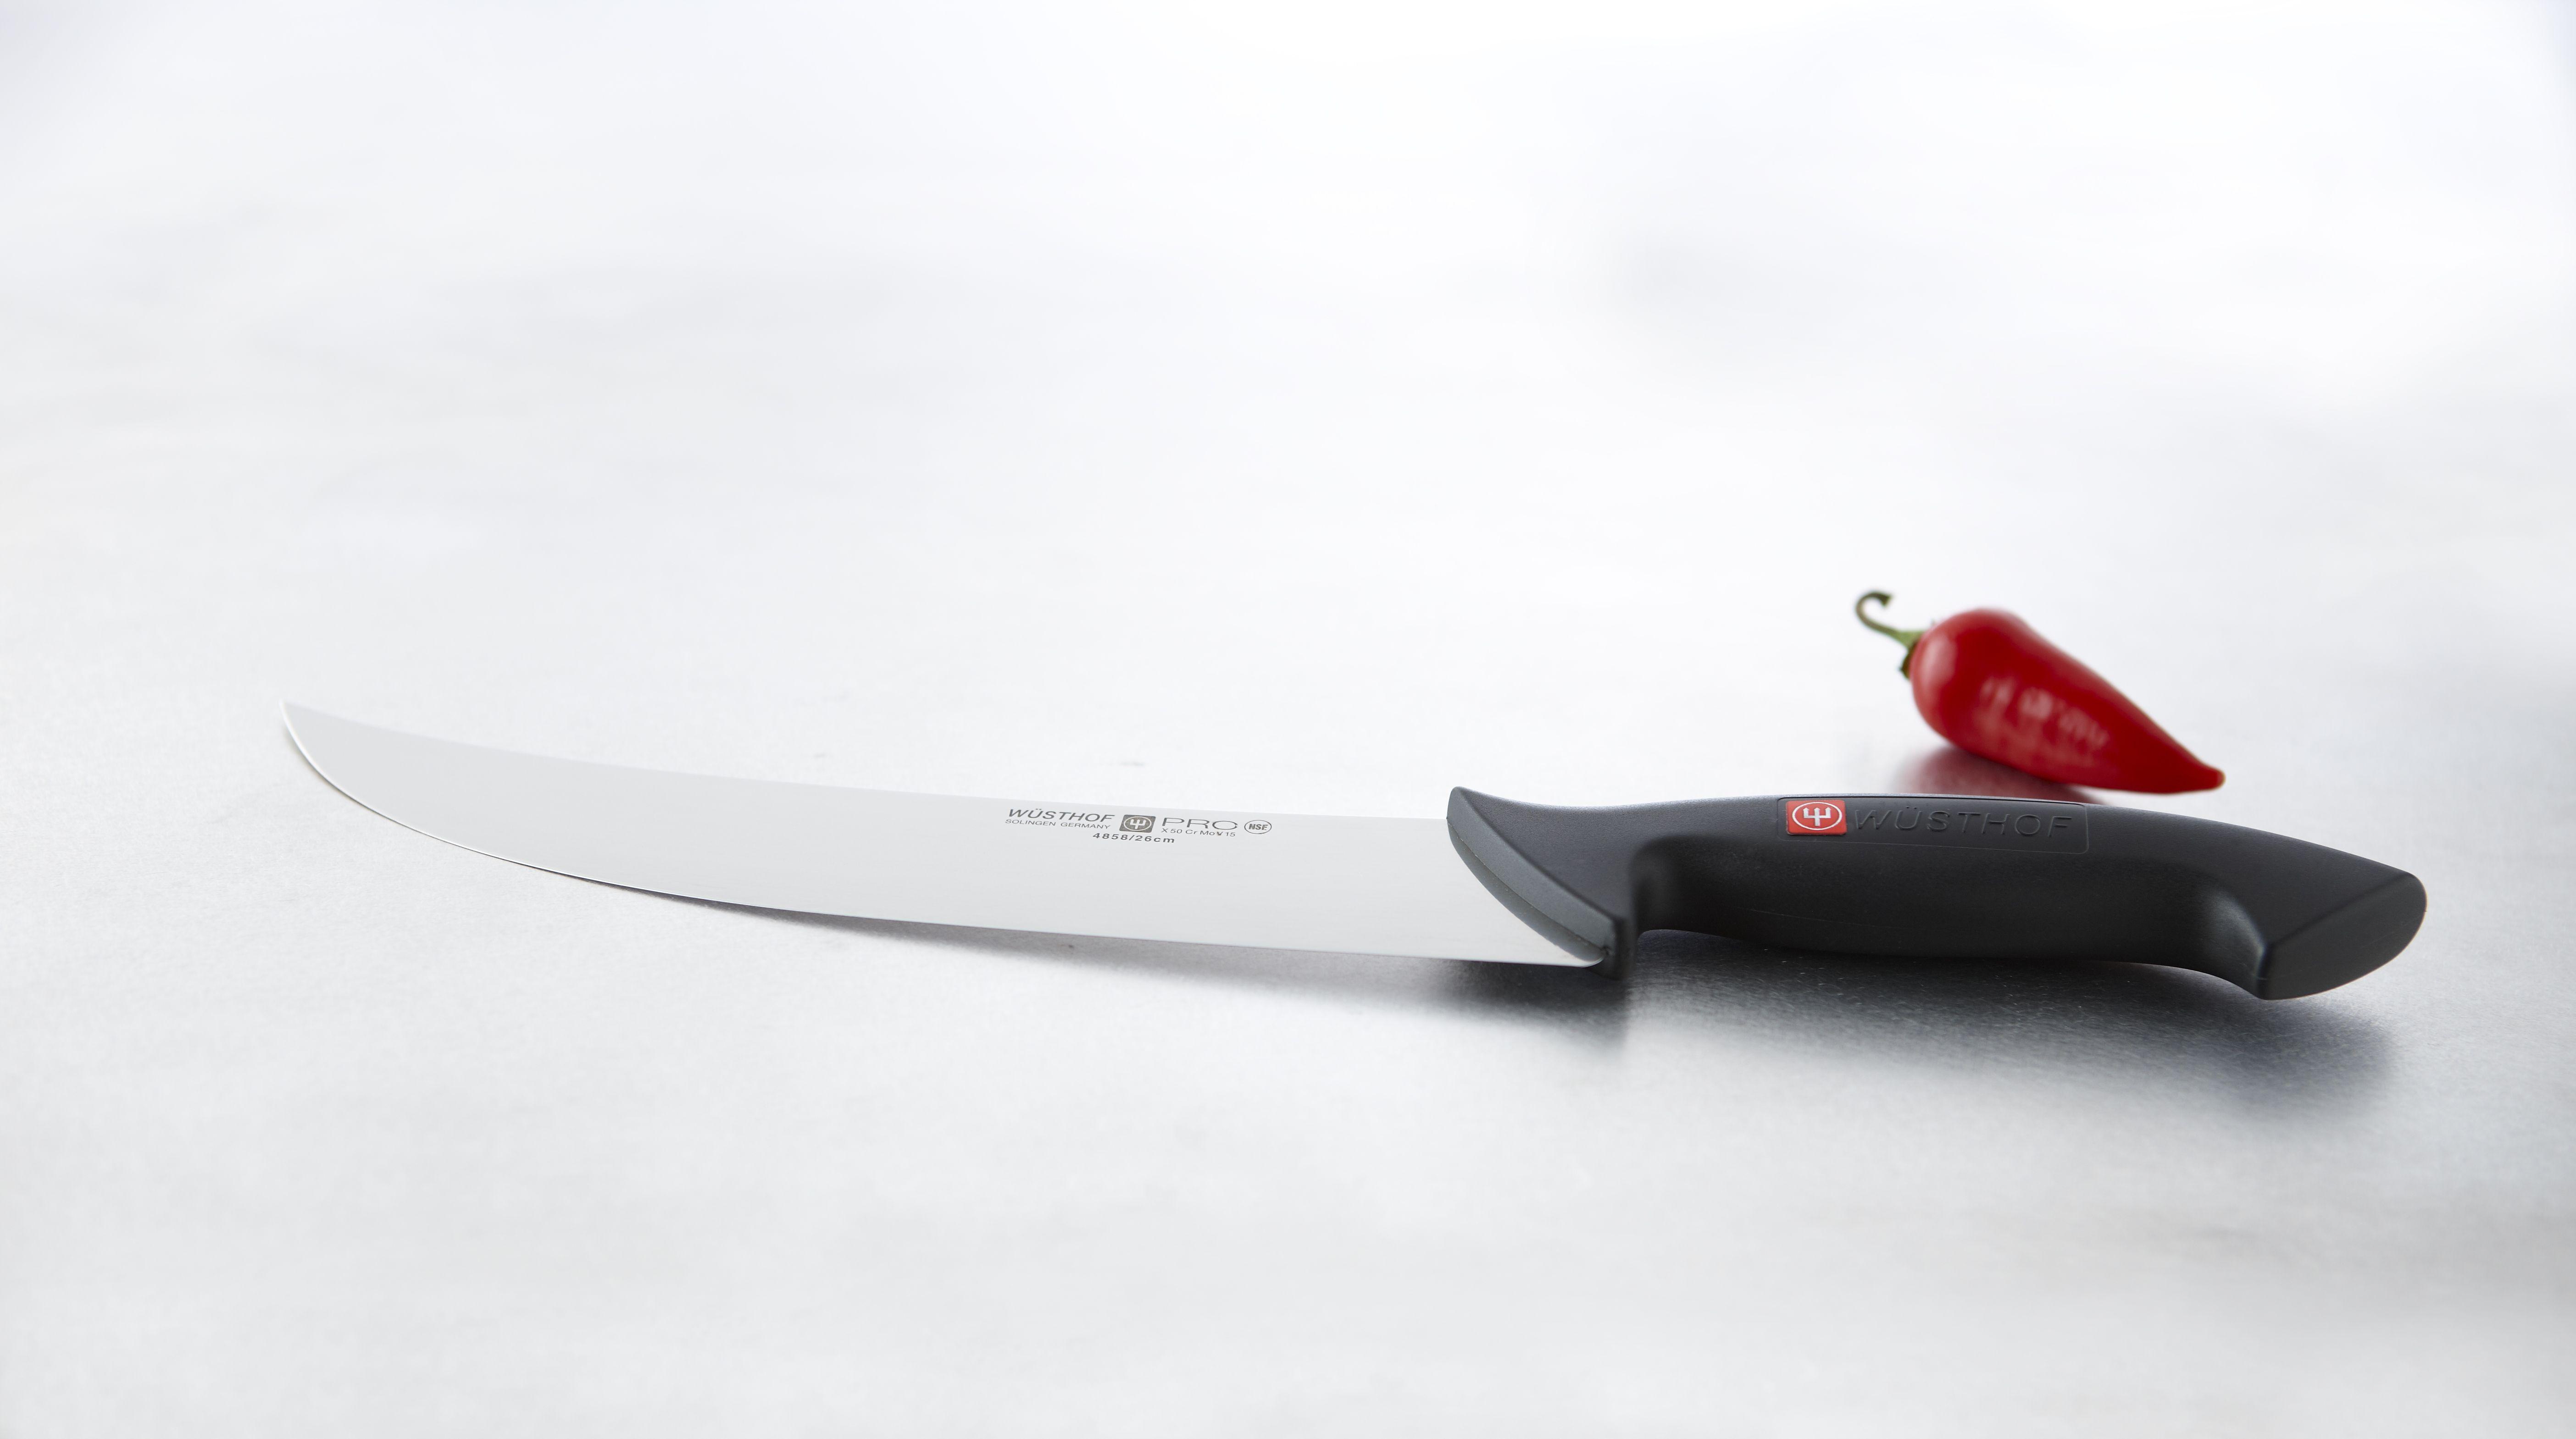 Park Art My WordPress Blog_What Is A Granton Blade Santoku Knife Used For